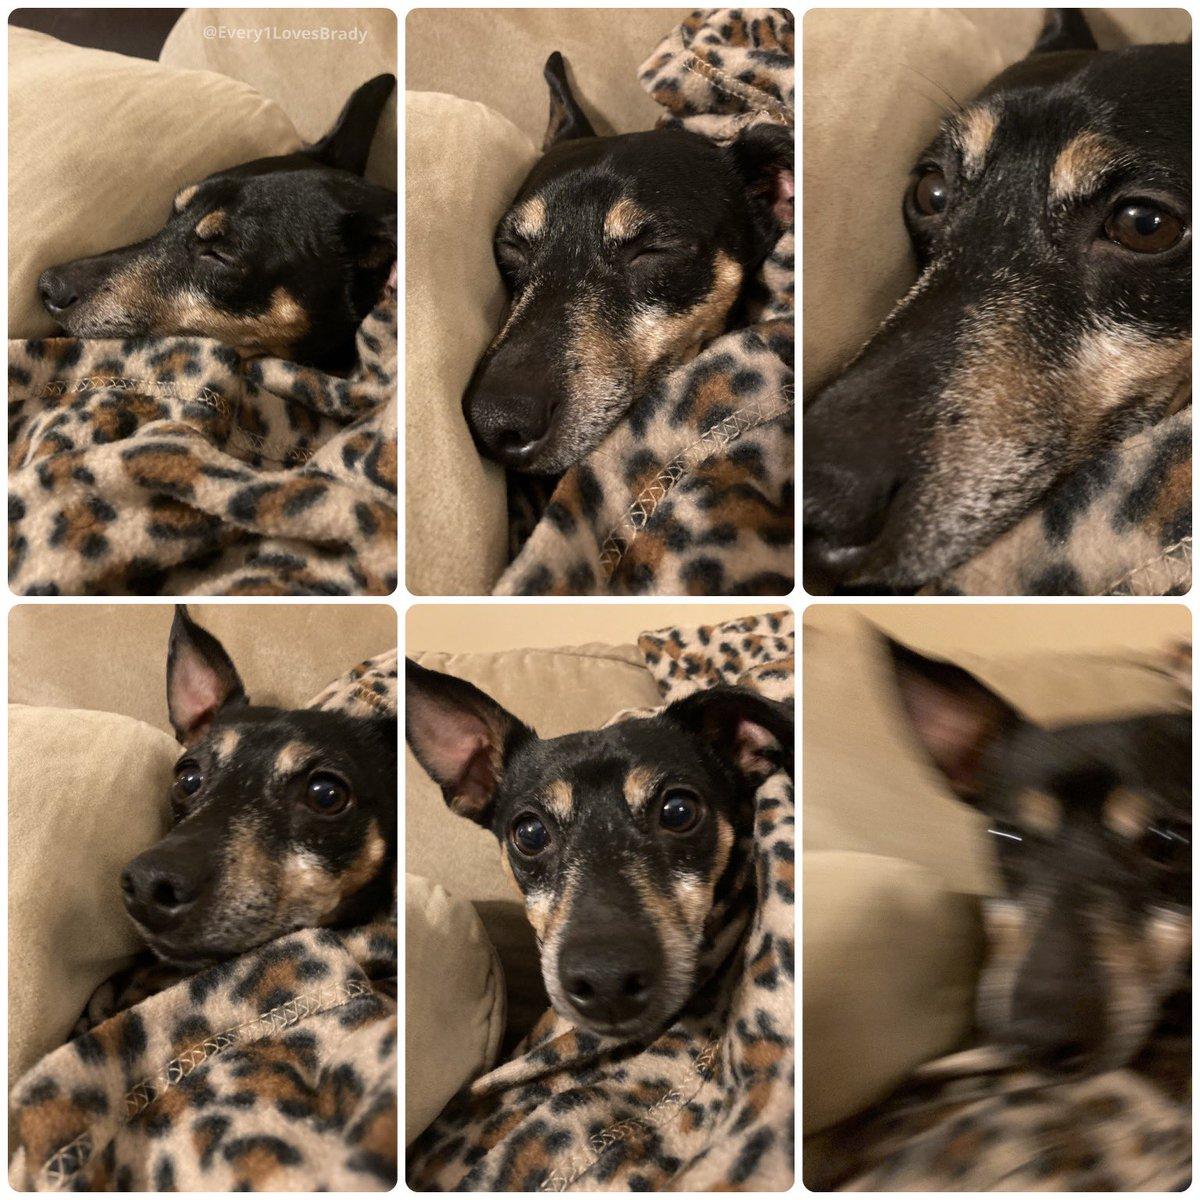 The snuggle is real for Mr. T 🐾 💤  . . . . #MrT #Every1LovesBrady #dogs #dogsofinstagram #rescuedog #adoptdontshop #twinpins #happydog #ilovedogs #dogears #sleepydog #tireddog #dogtired #MrTPup #Every1LuvsBrady